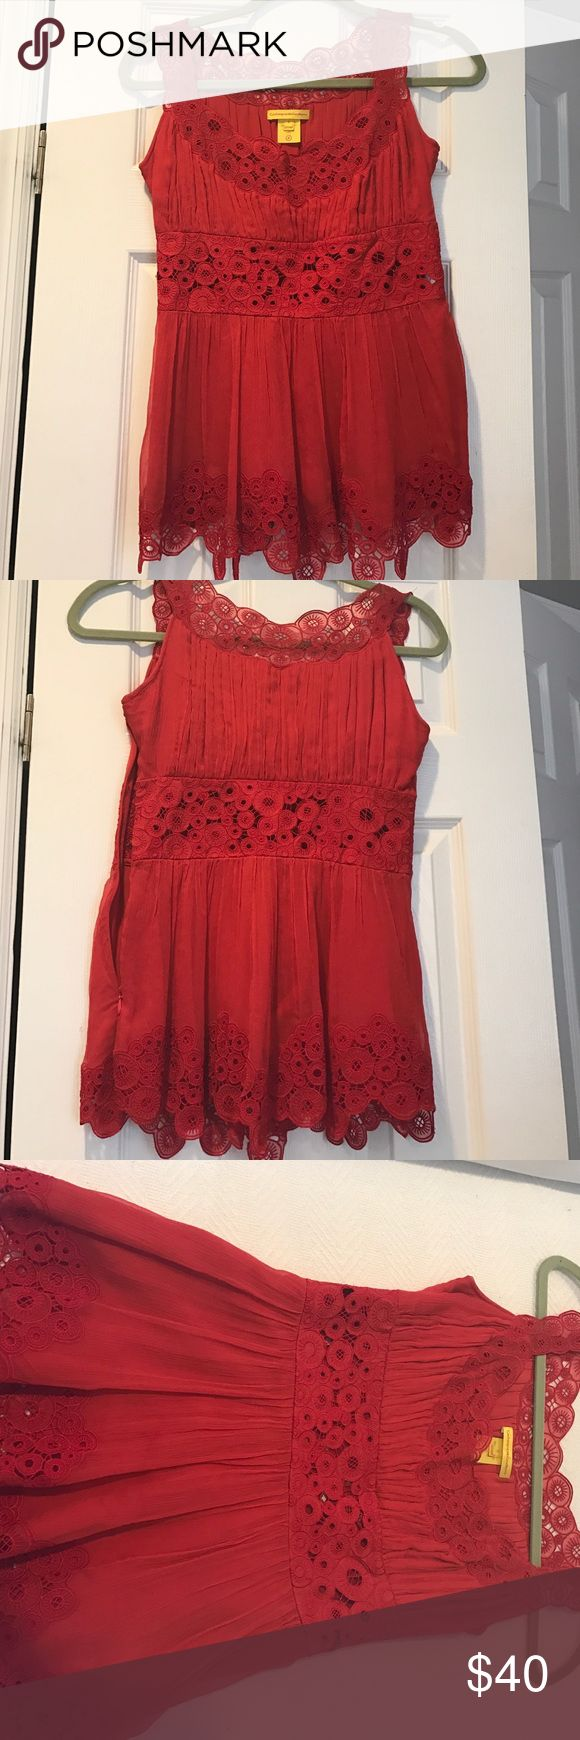 Catherine malandrino silk top Catherine Malandrino silk lace top with side zipper Catherine Malandrino Tops Blouses